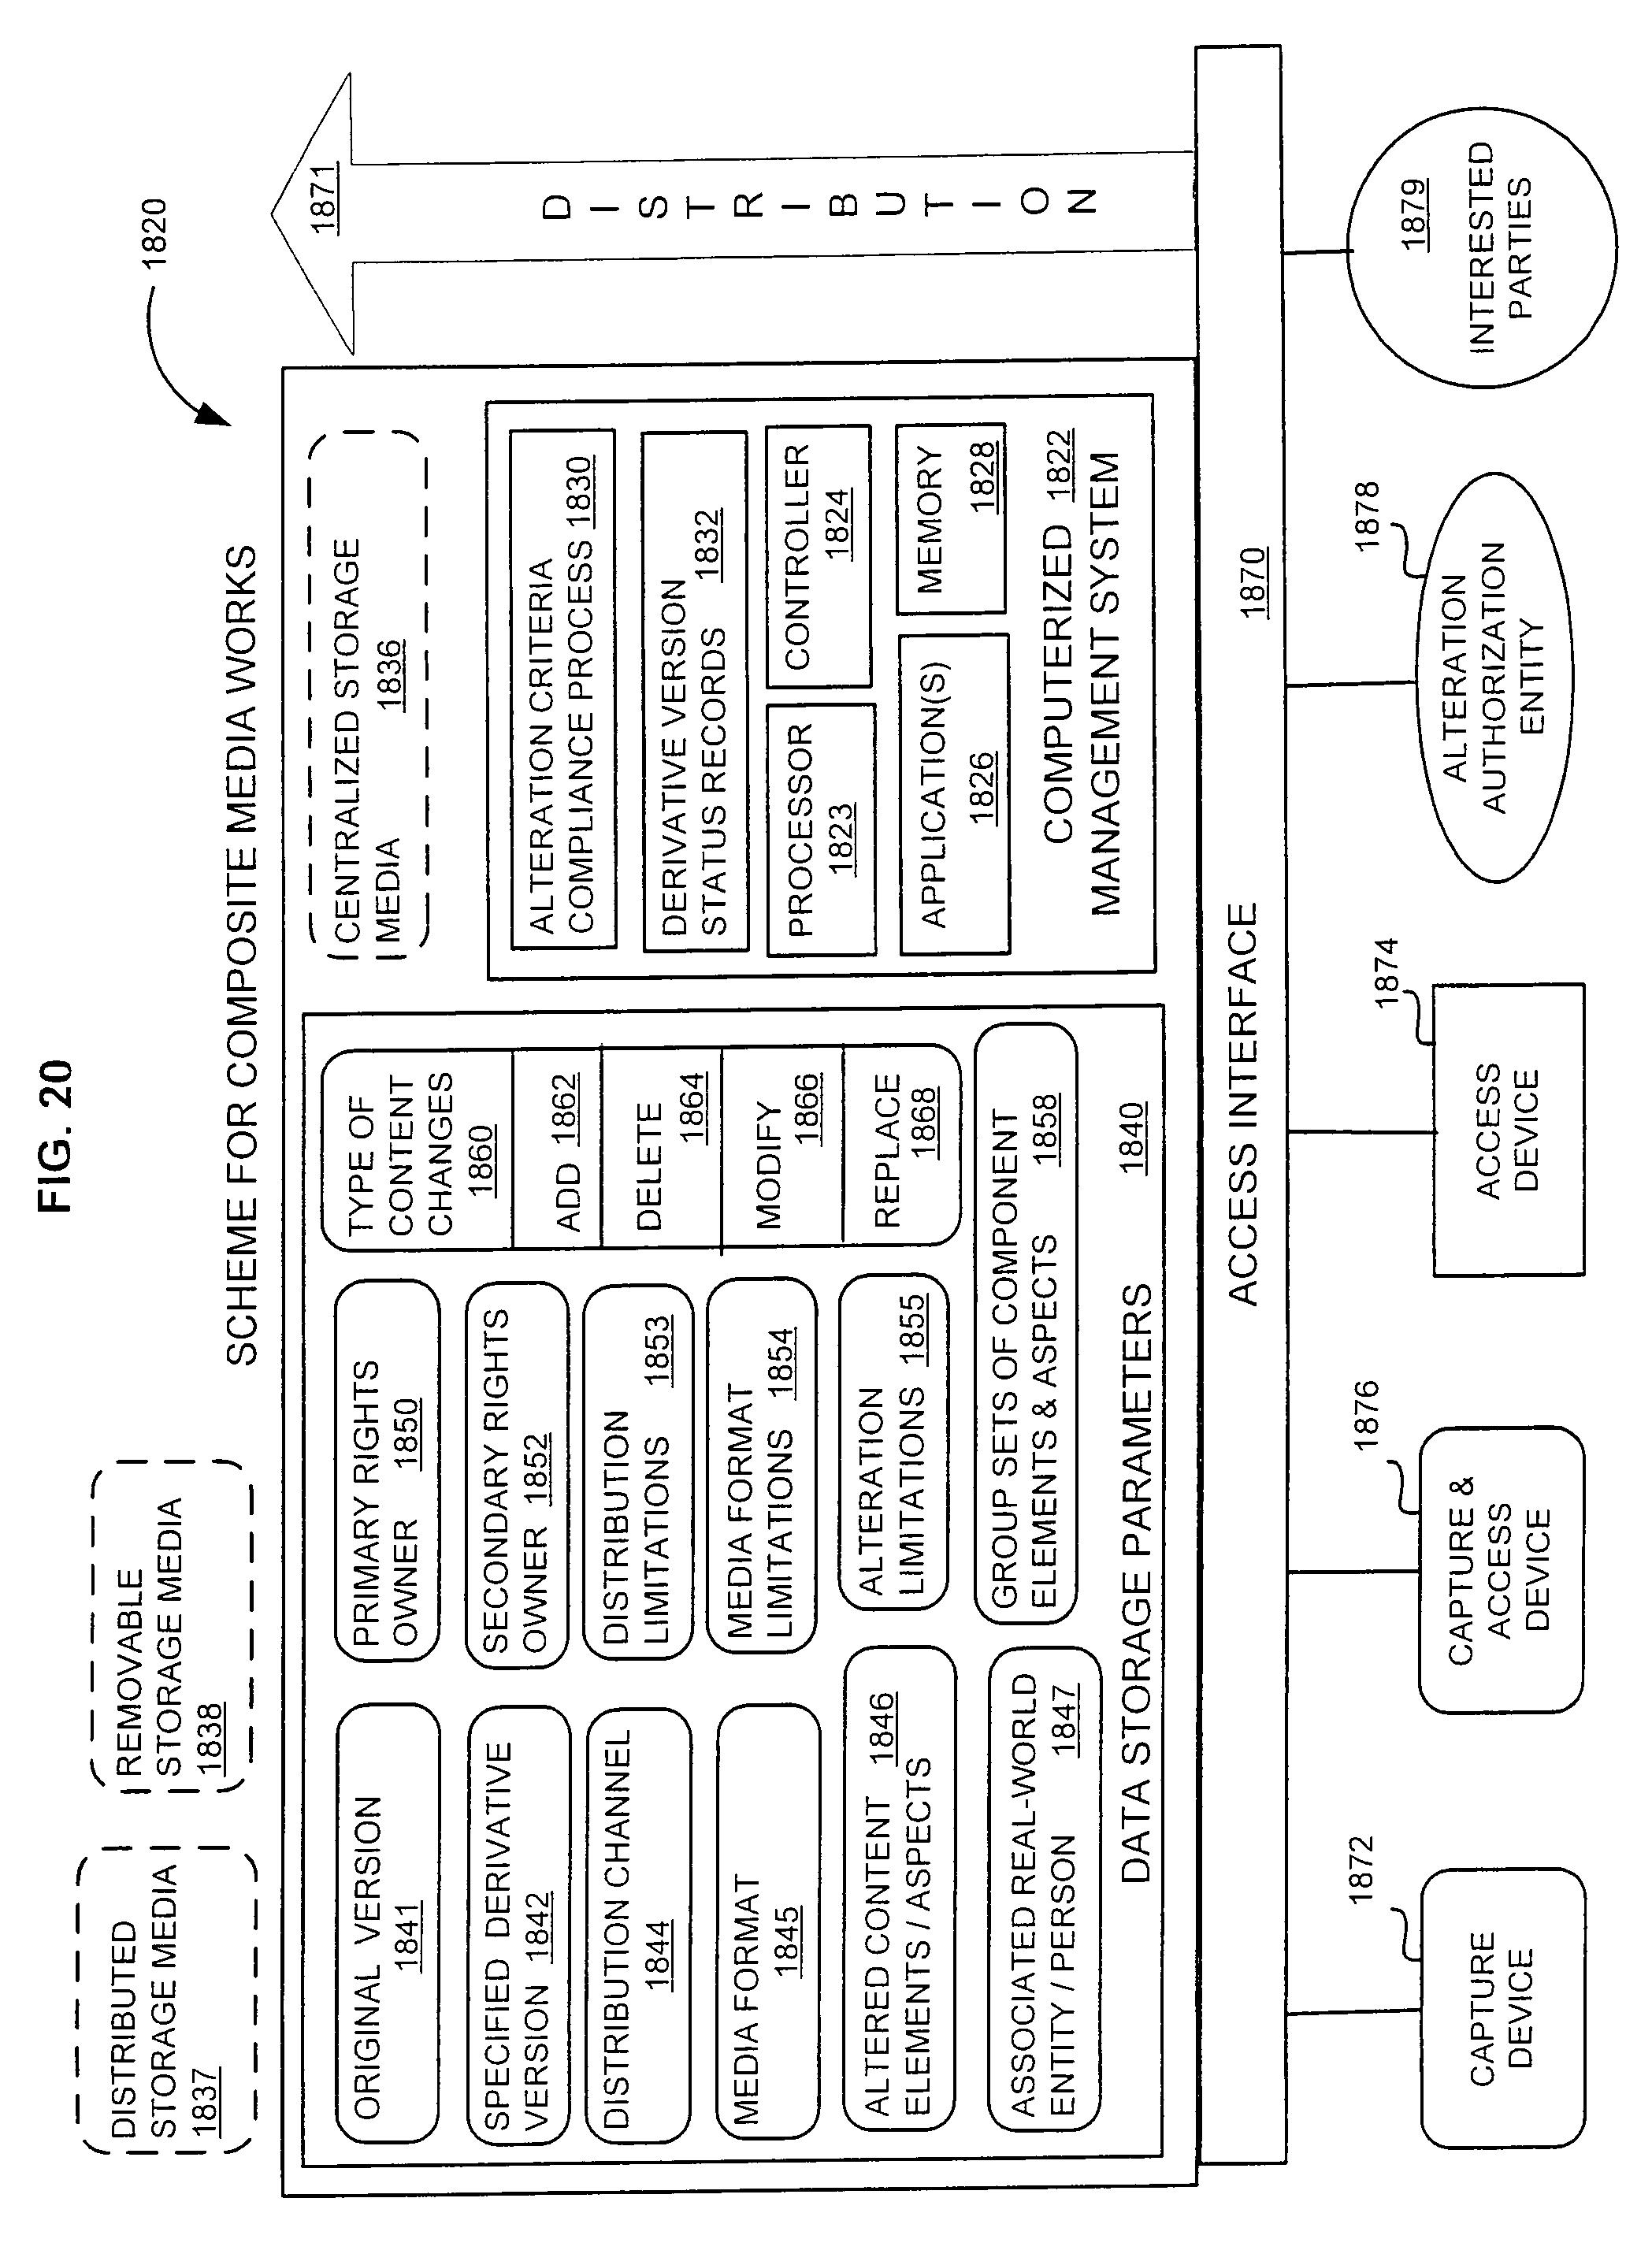 Patent US 9,065,979 B2